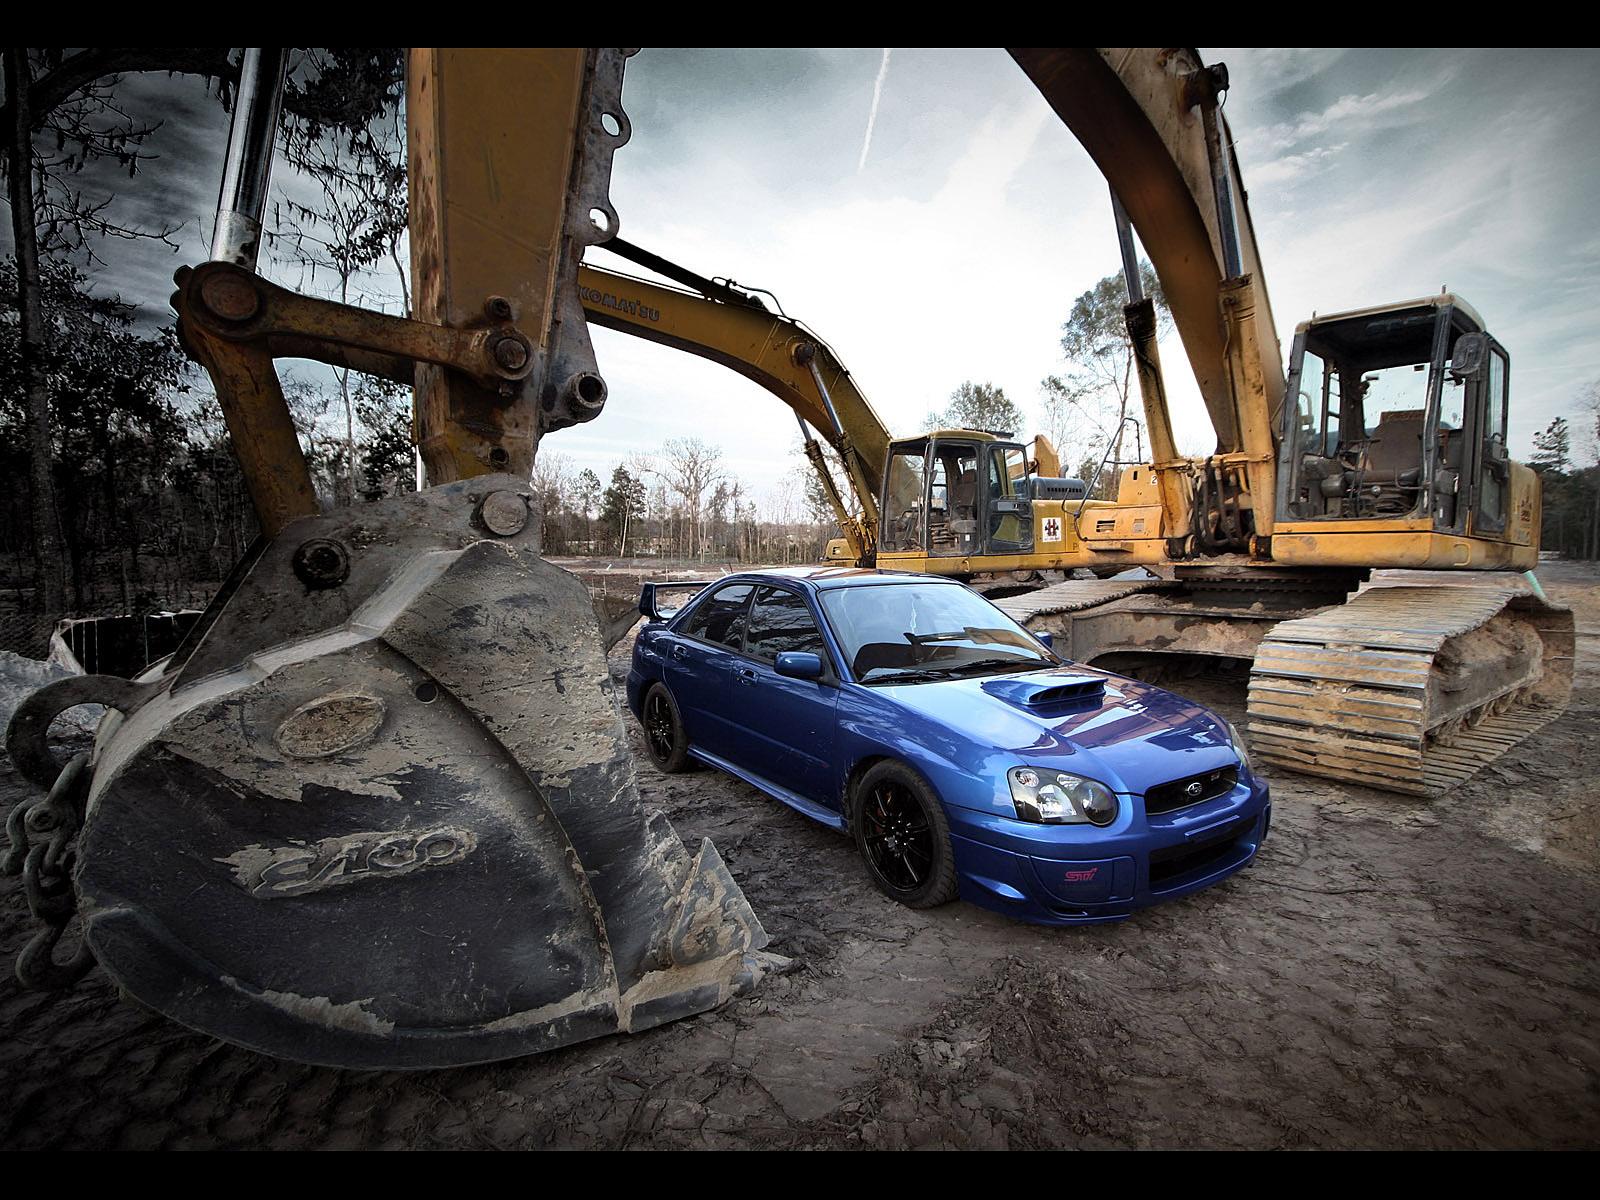 http://4.bp.blogspot.com/-Ku4orOAyV9M/TwC1hGiQiKI/AAAAAAAADtc/m7YgE0K2VD0/s1600/Subaru+Impreza+WRX.jpg